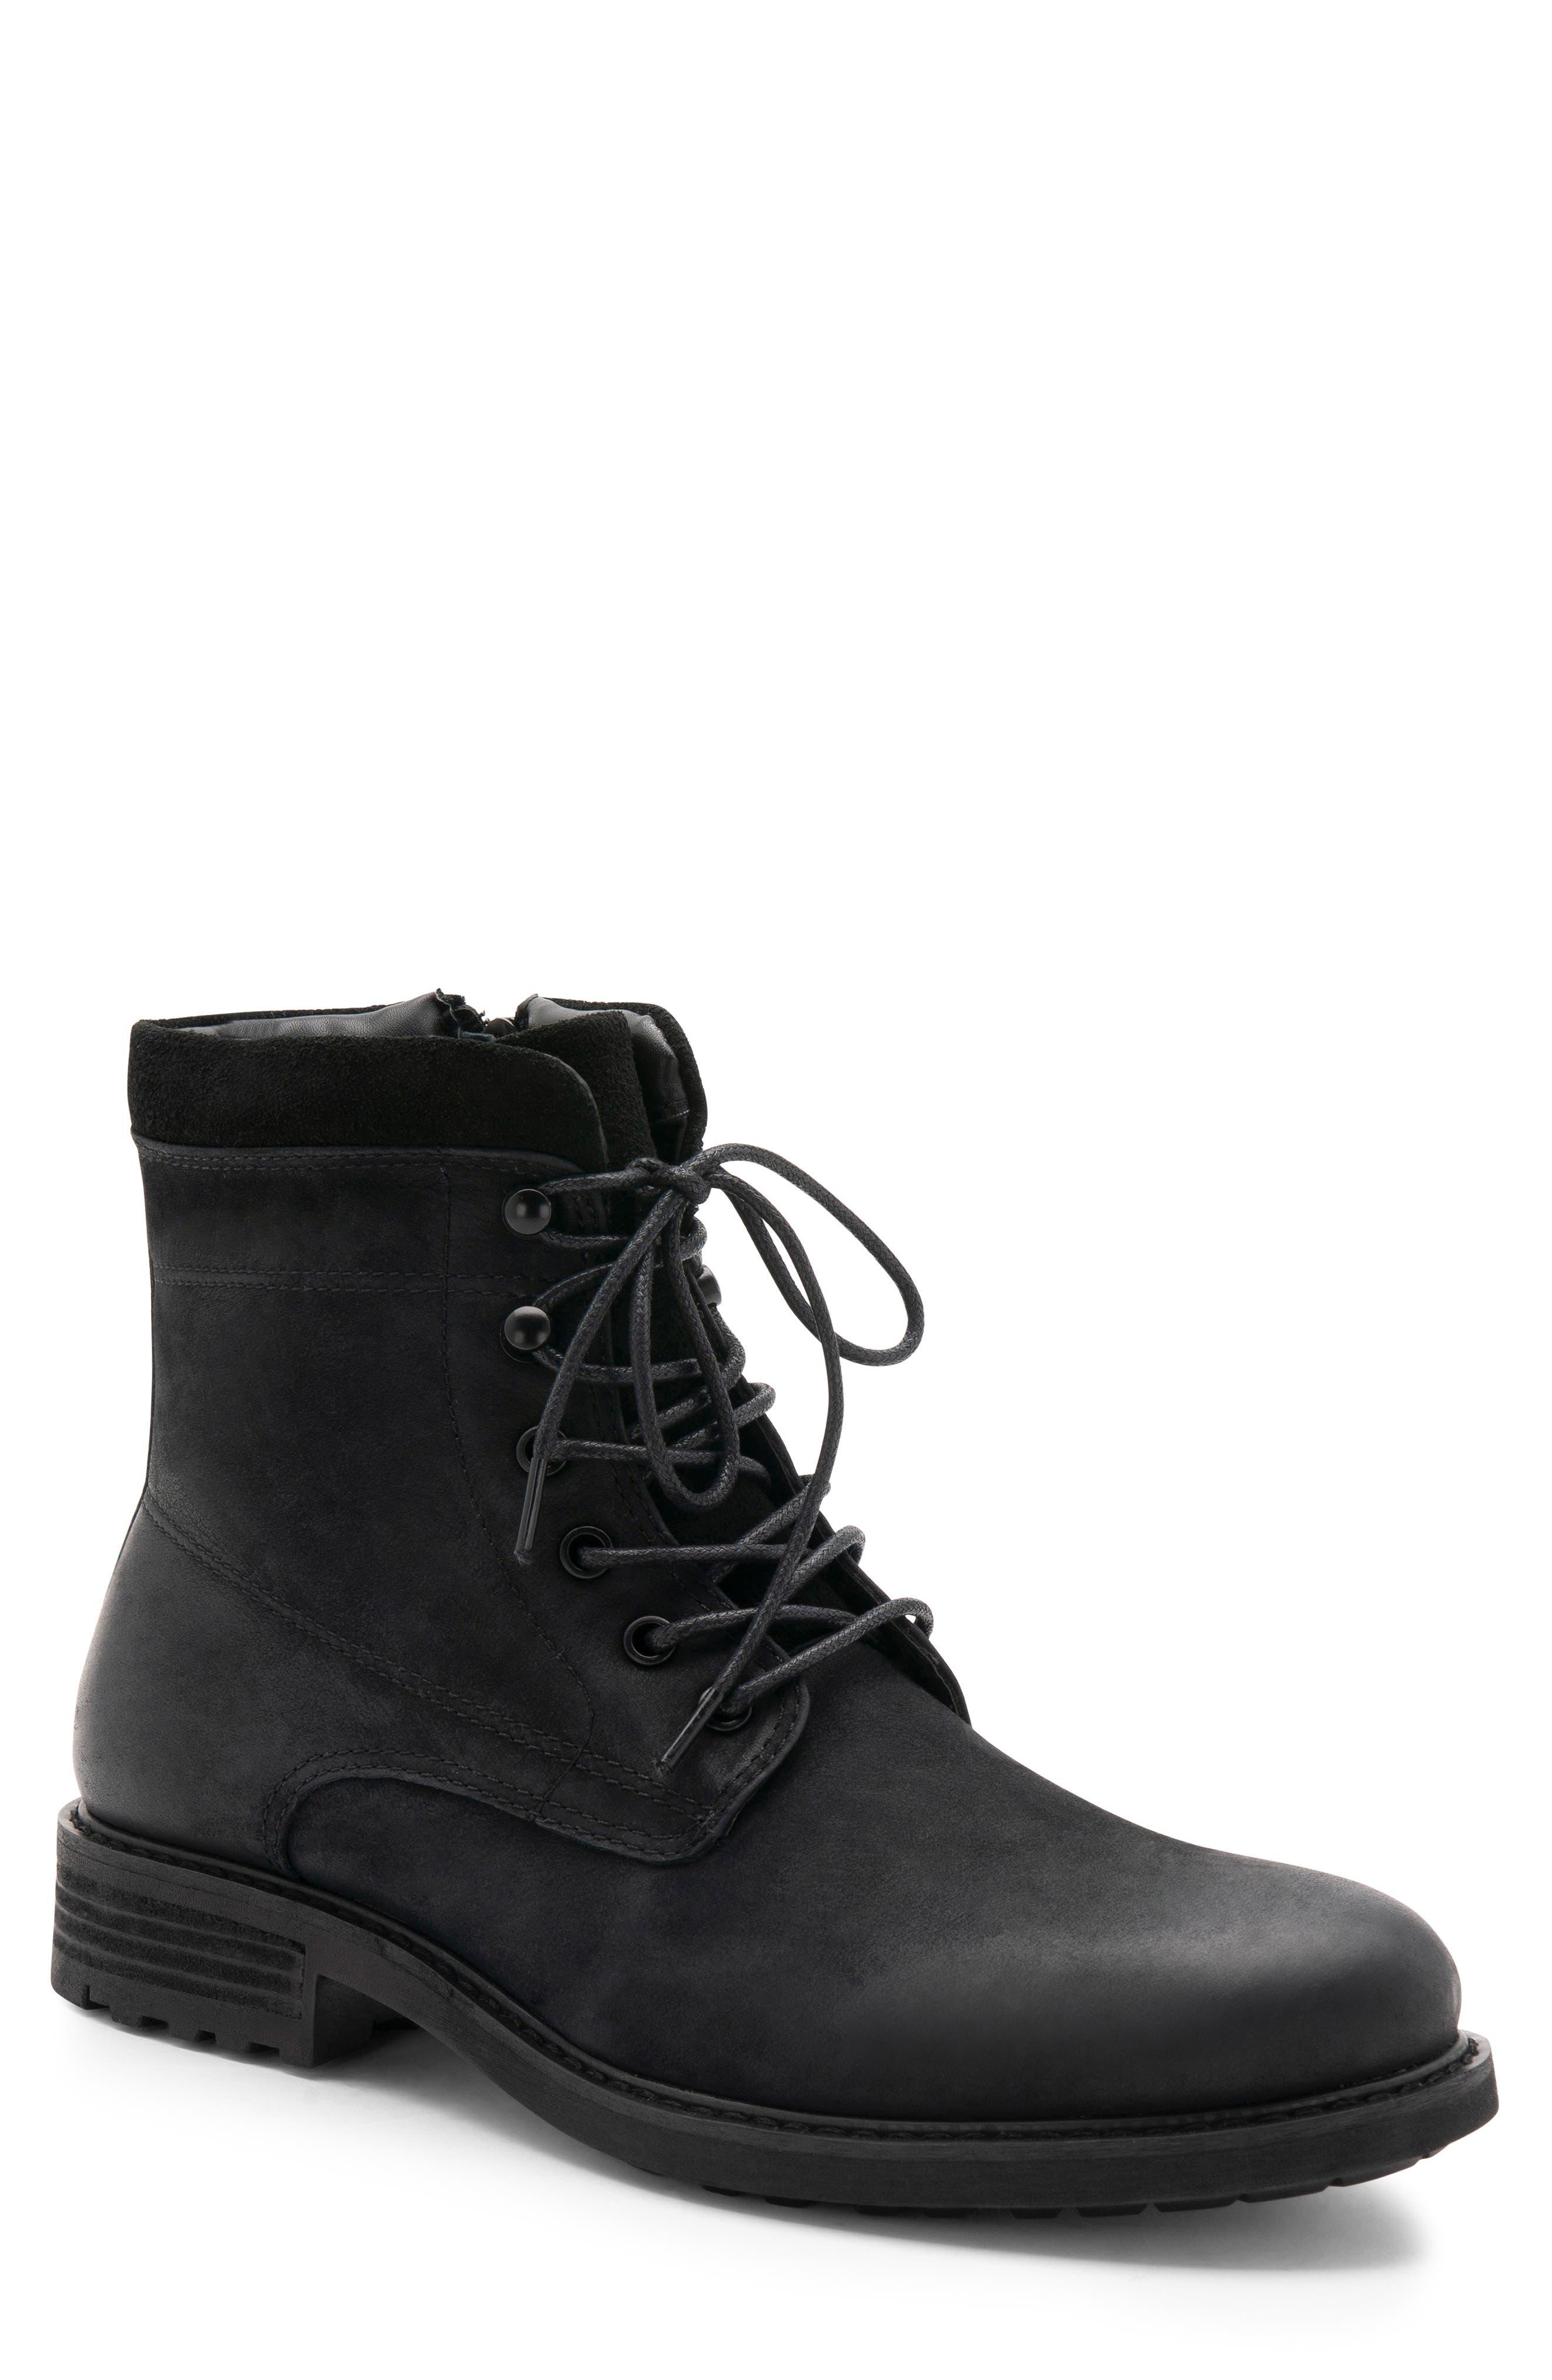 Blondo Patton Waterproof Plain Toe Boot, Black